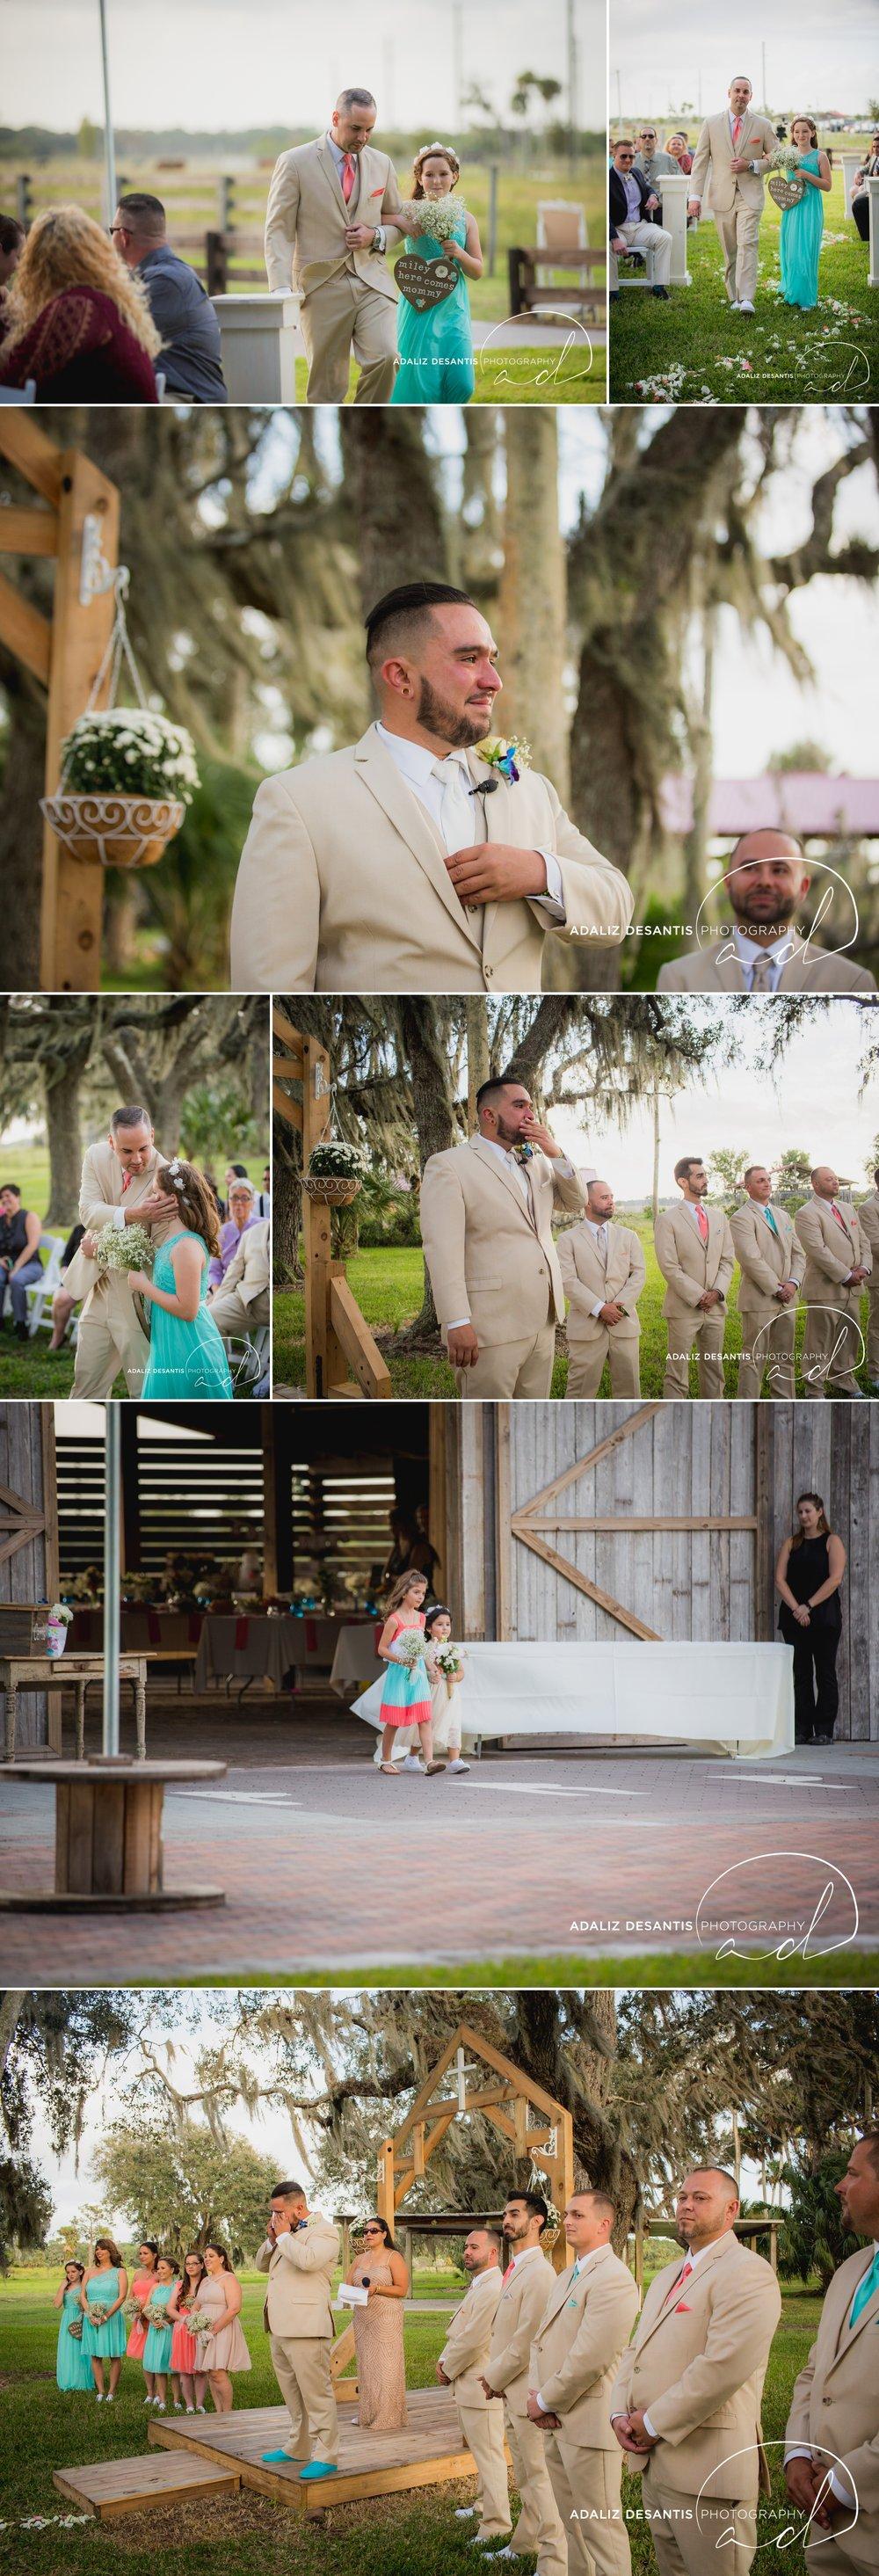 Pine Ridge Plantation Port Saint Lucie okeechobee wedding shabby chic dyi barn wedding teal coral miles crystal cardenas 15.jpg